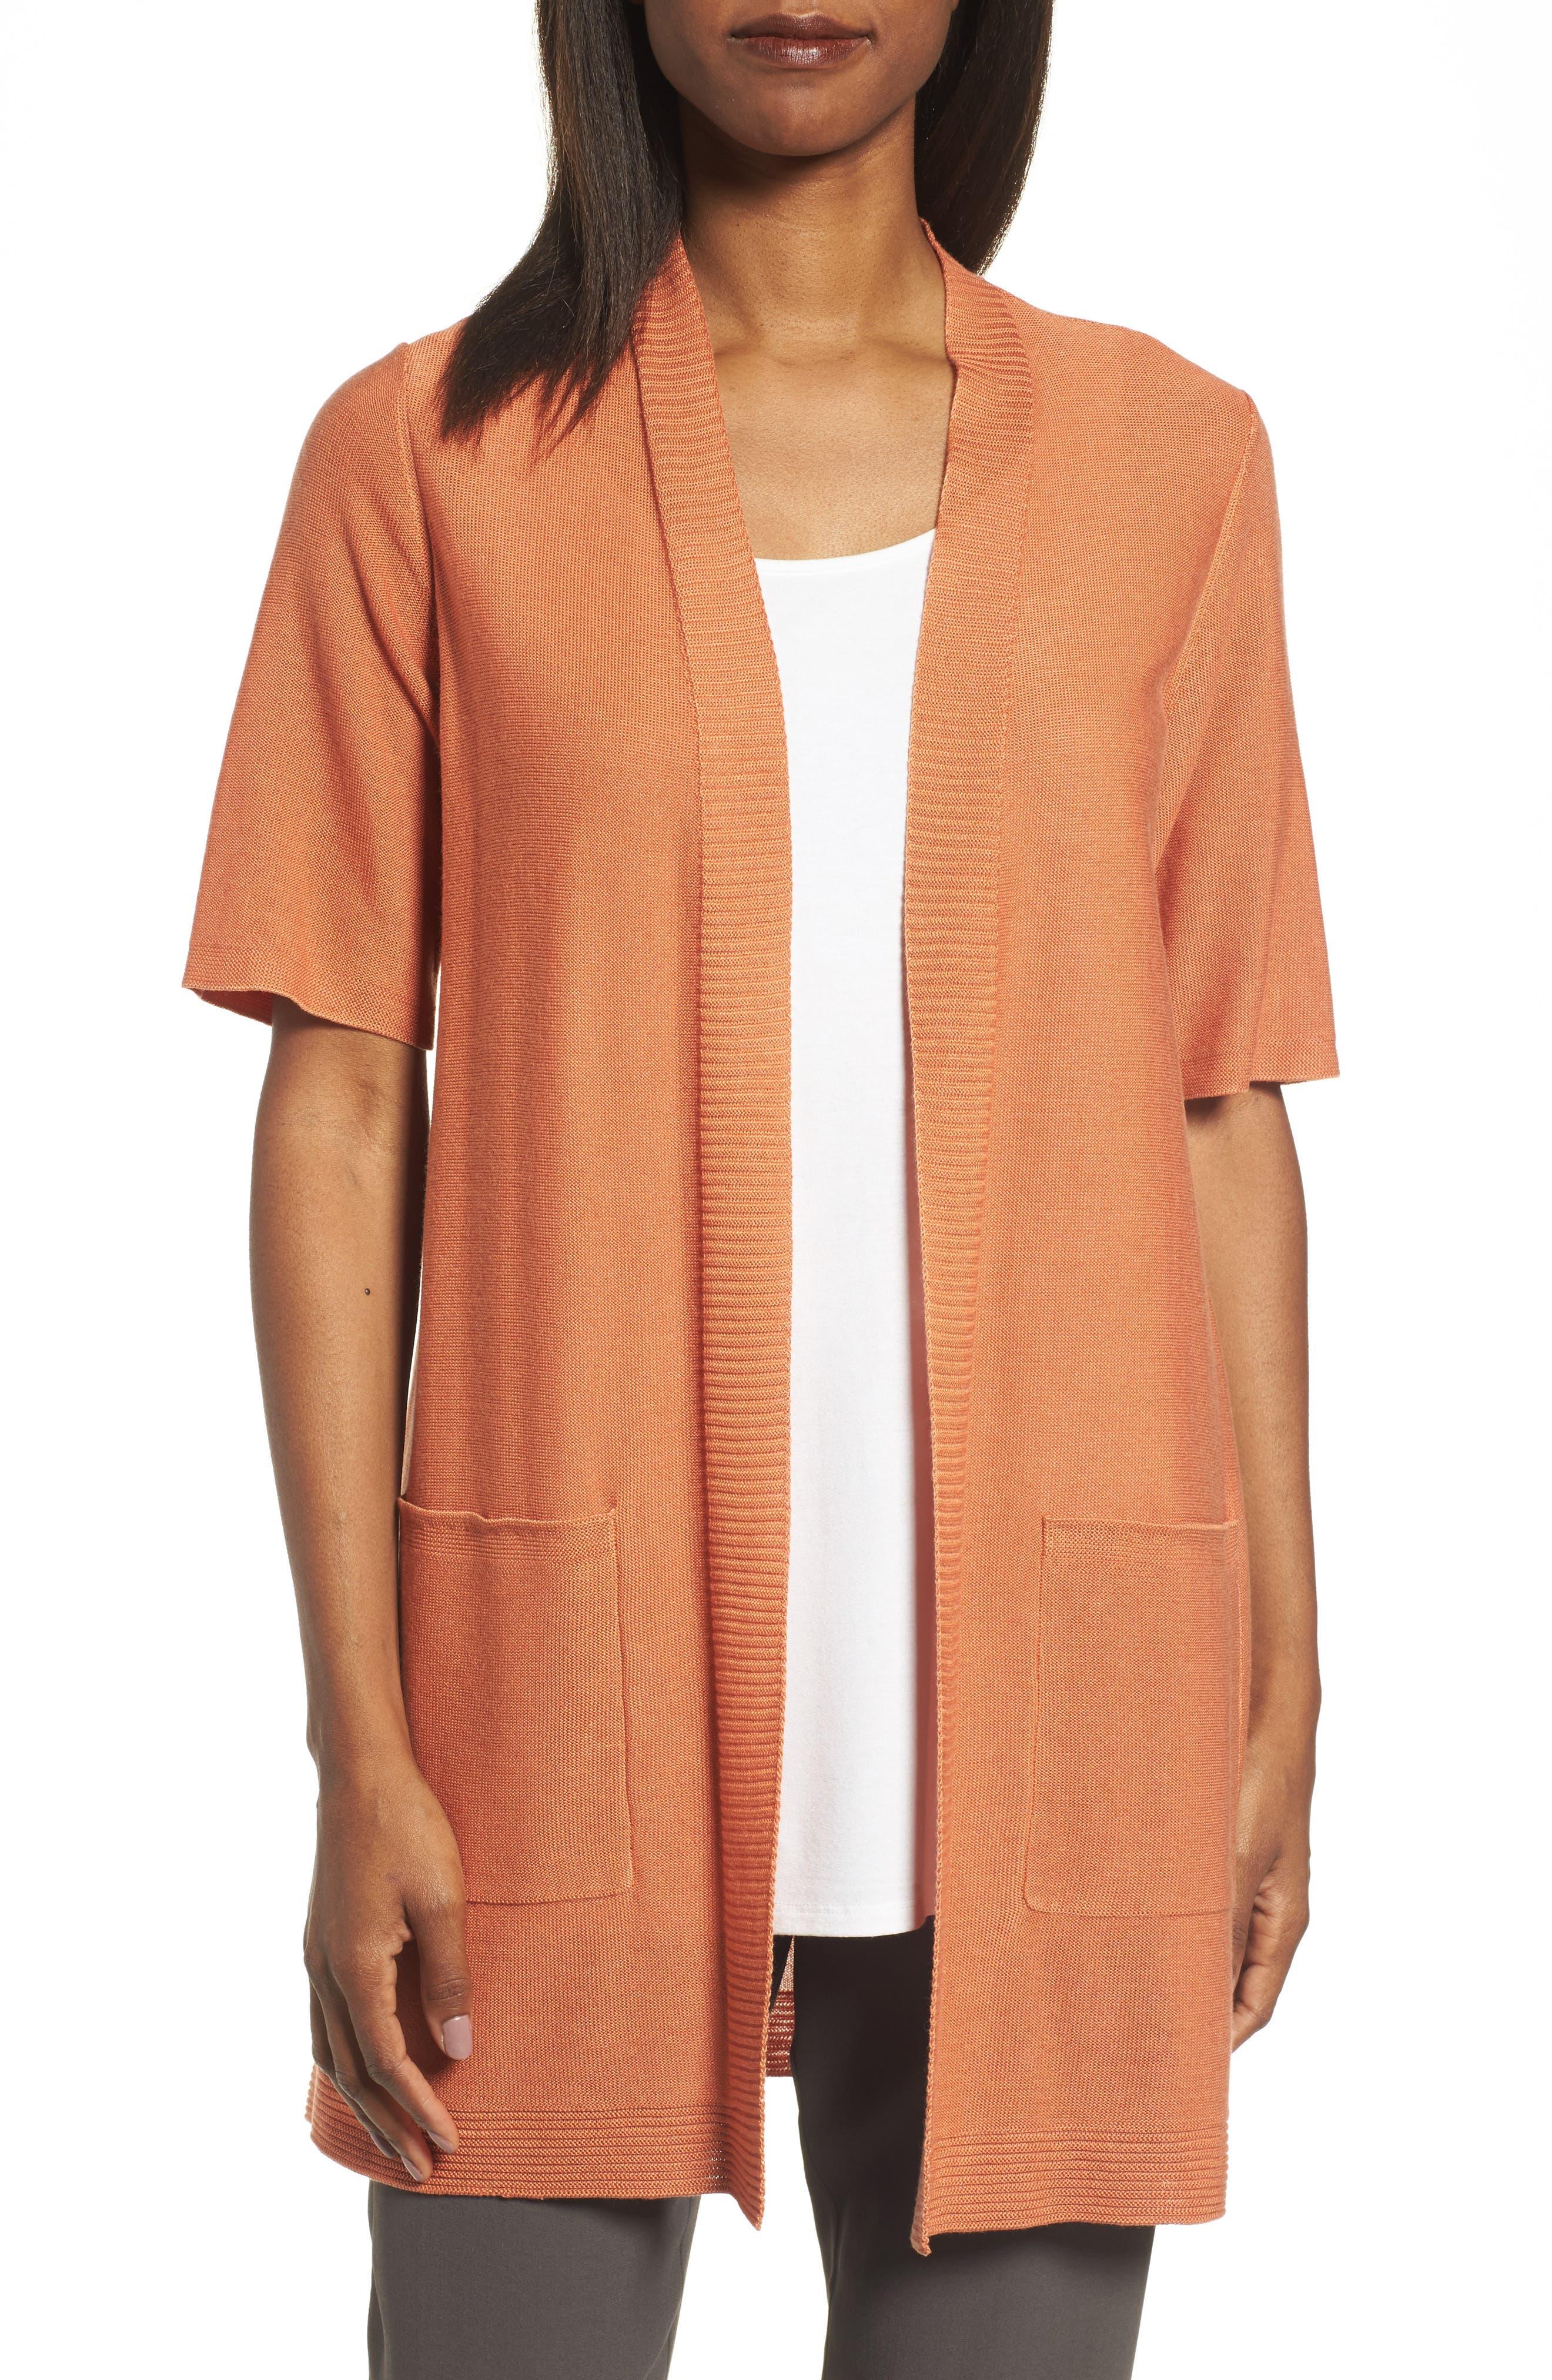 Simple Tencel<sup>®</sup> & Merino Wool Cardigan,                             Main thumbnail 1, color,                             Pumpkin